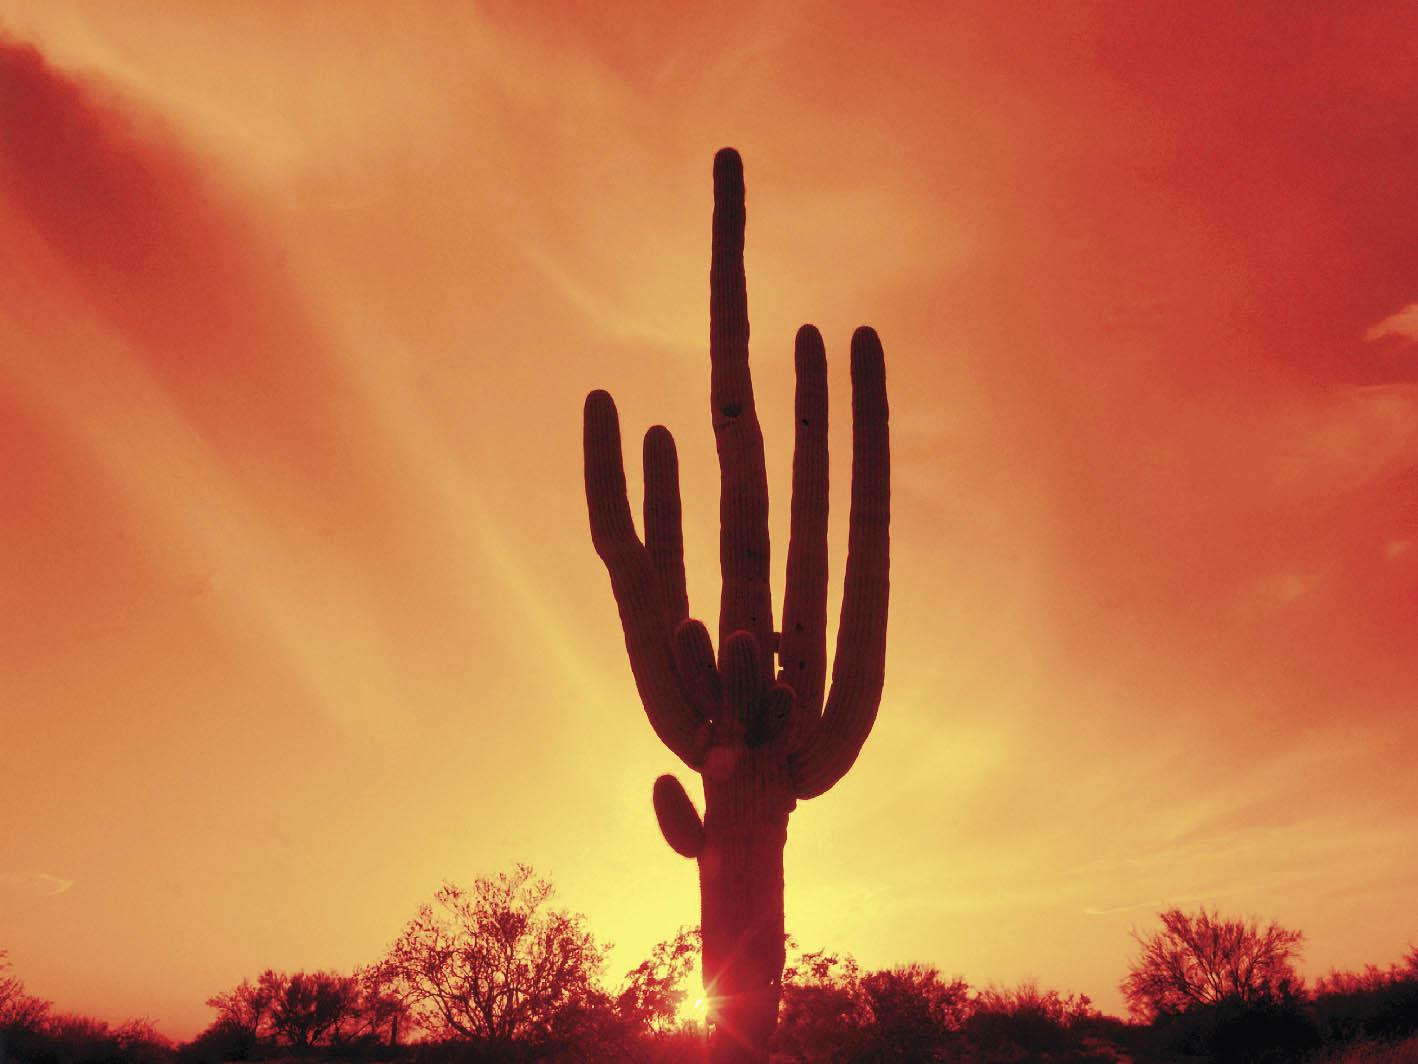 Ein großer Kaktus im Abendrot des Himmels